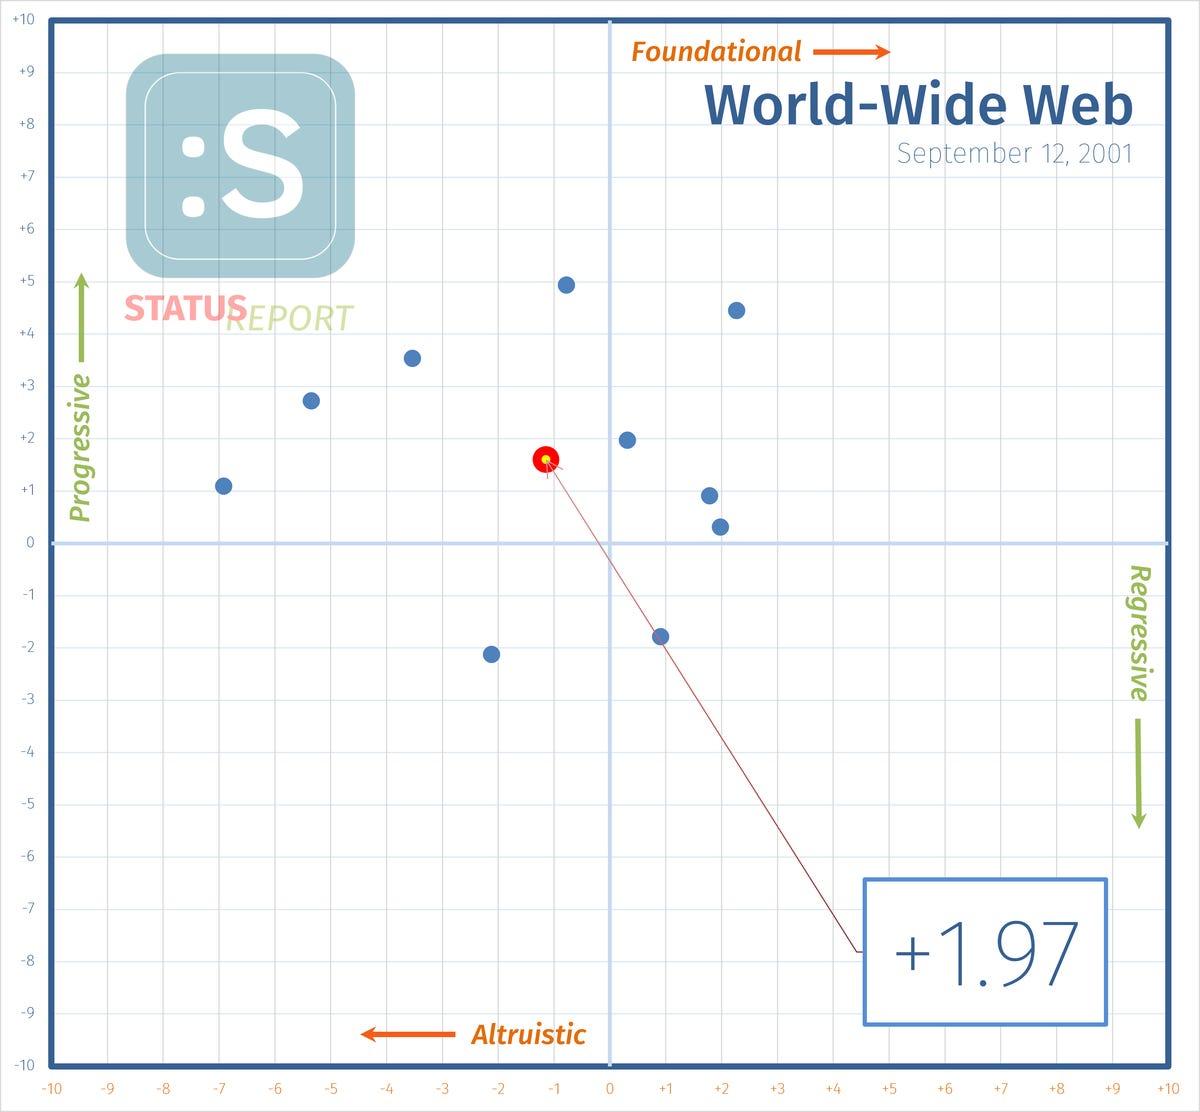 210119-world-wide-web-i-score.png